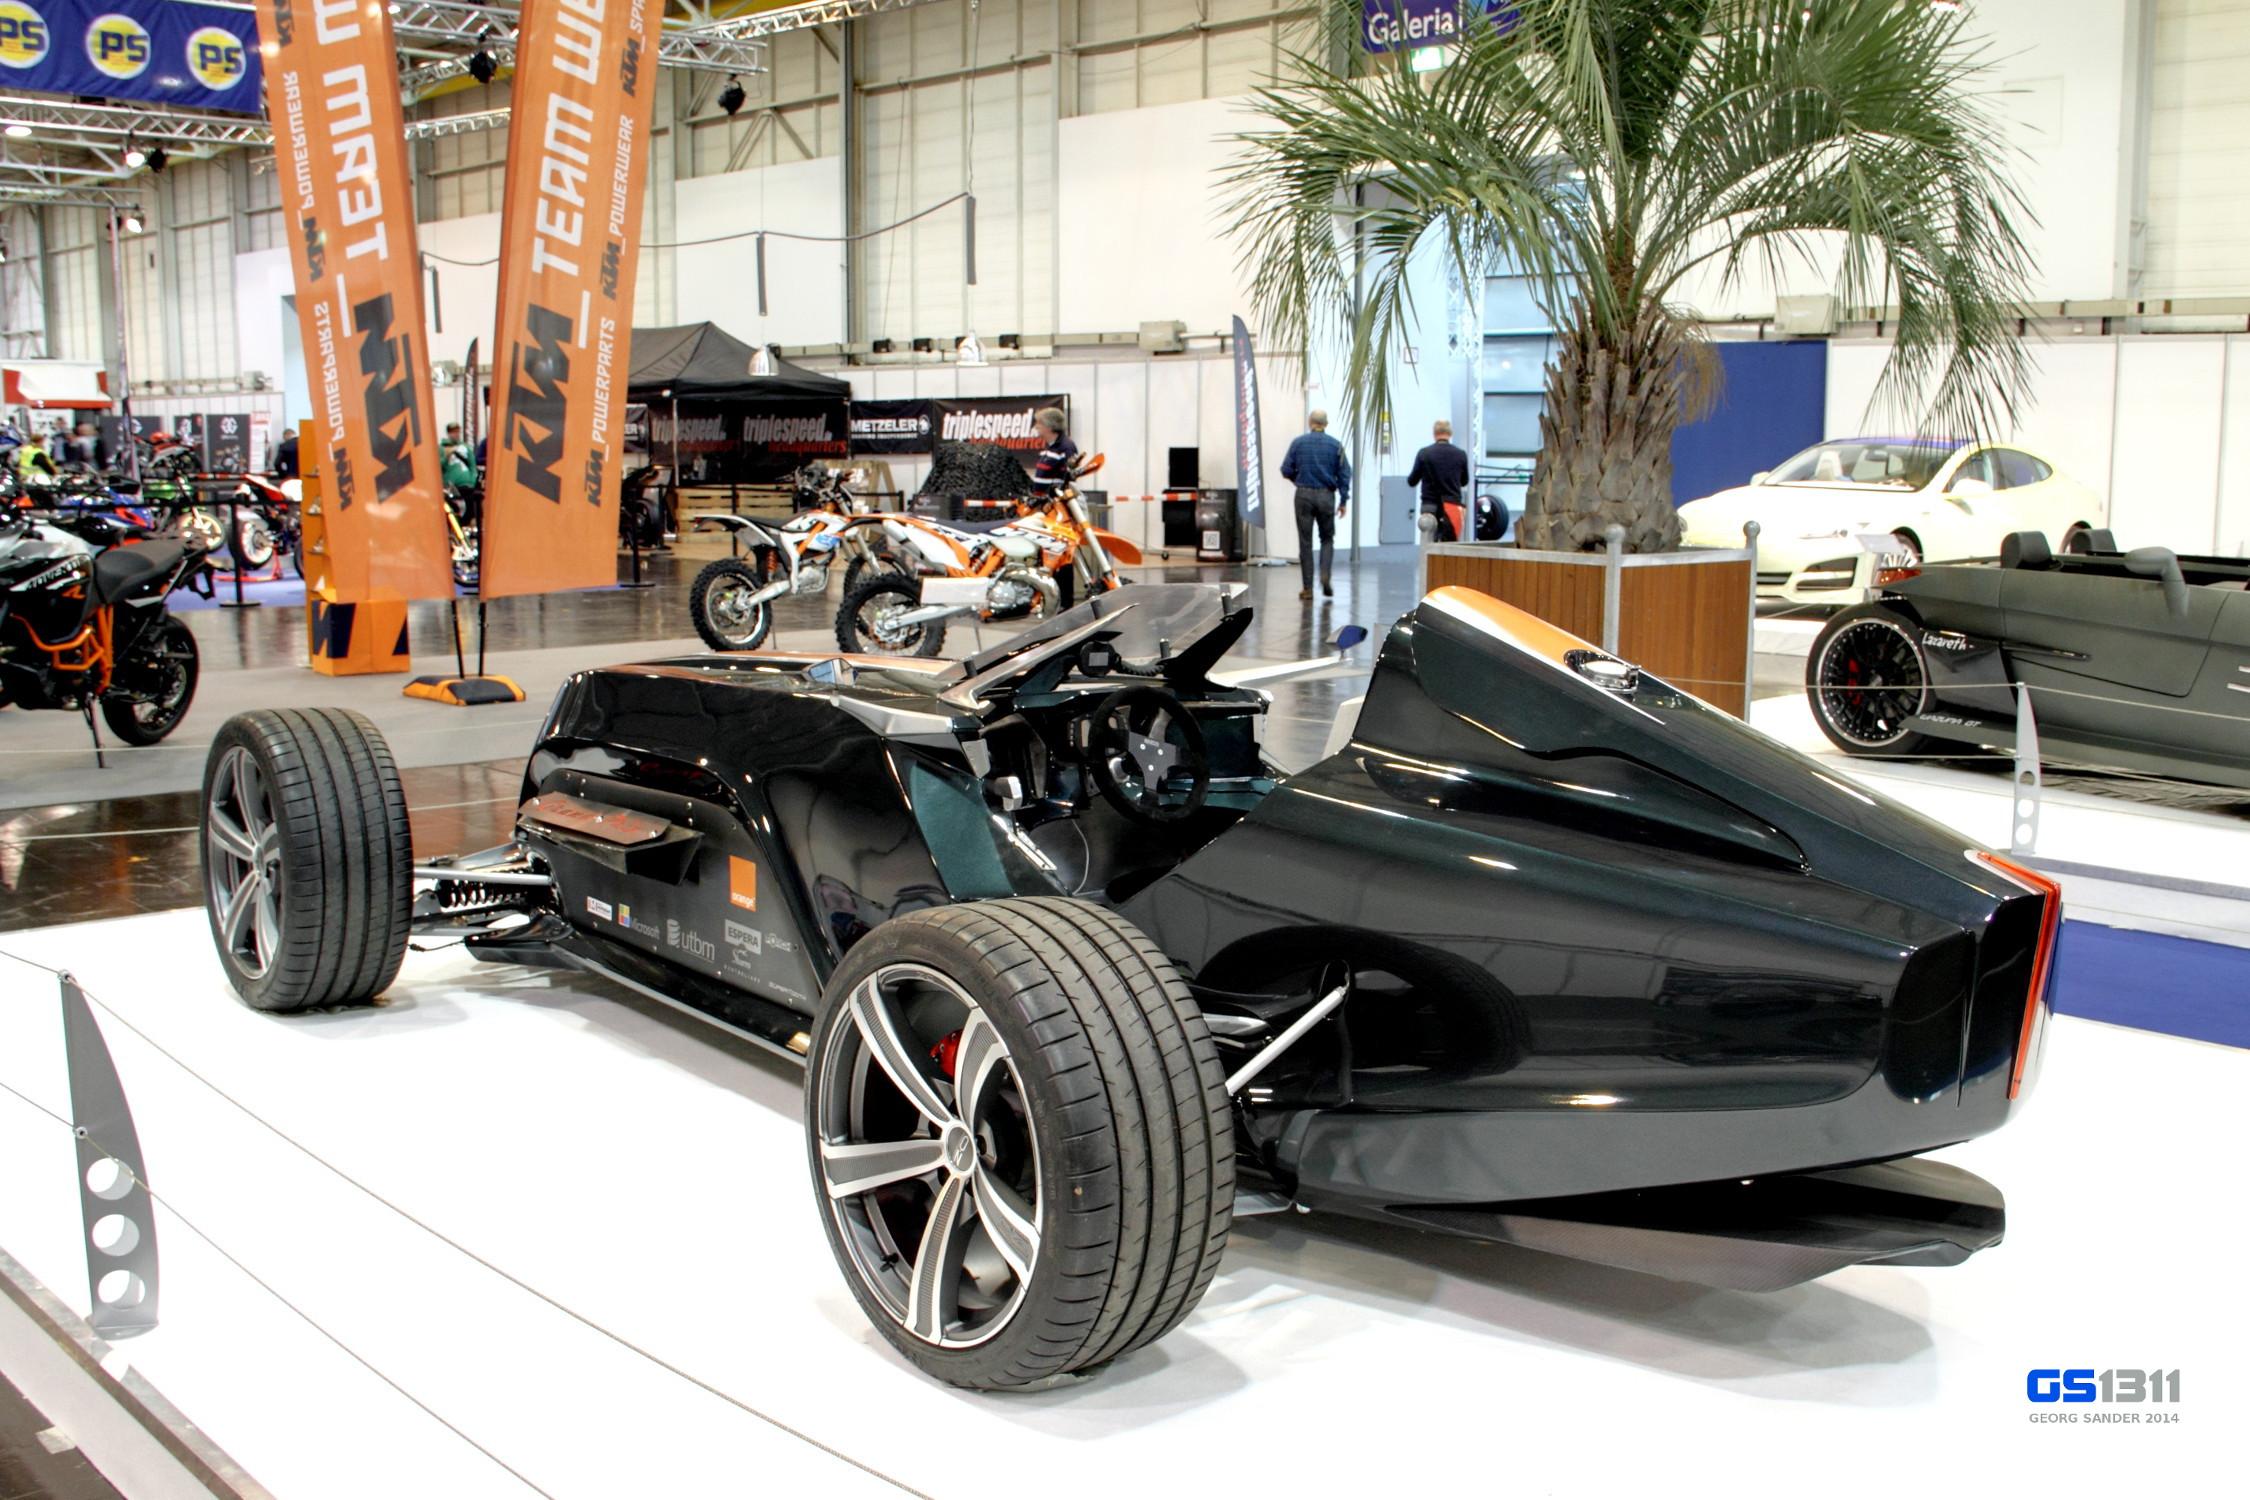 Wallpaper : sports car, performance car, Capture, shot, 2014 ...